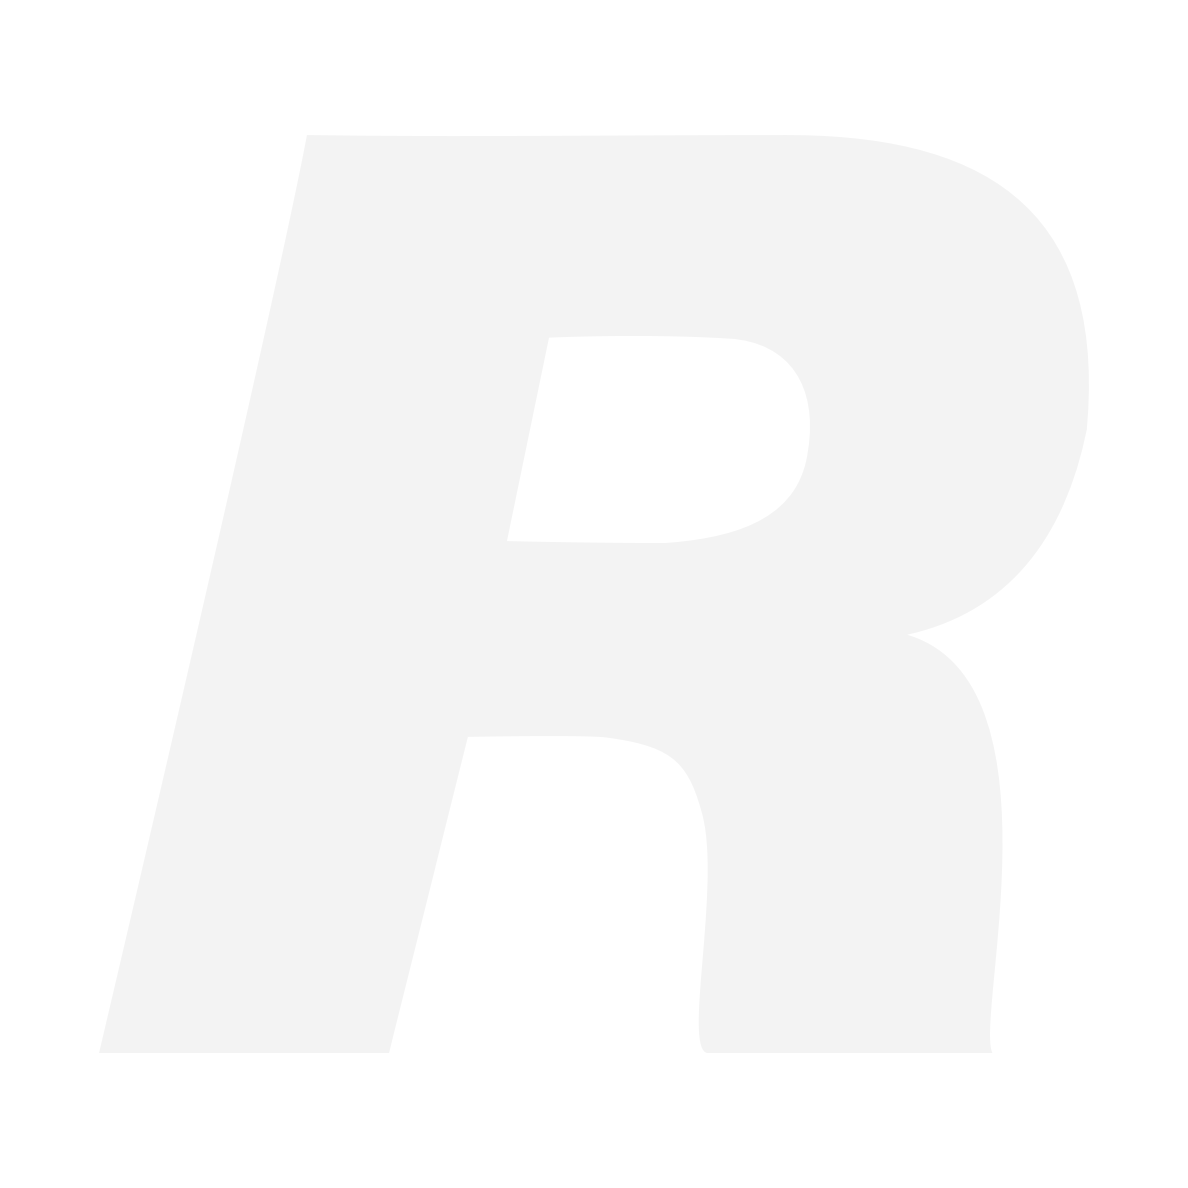 Röde Videomic med Rycote